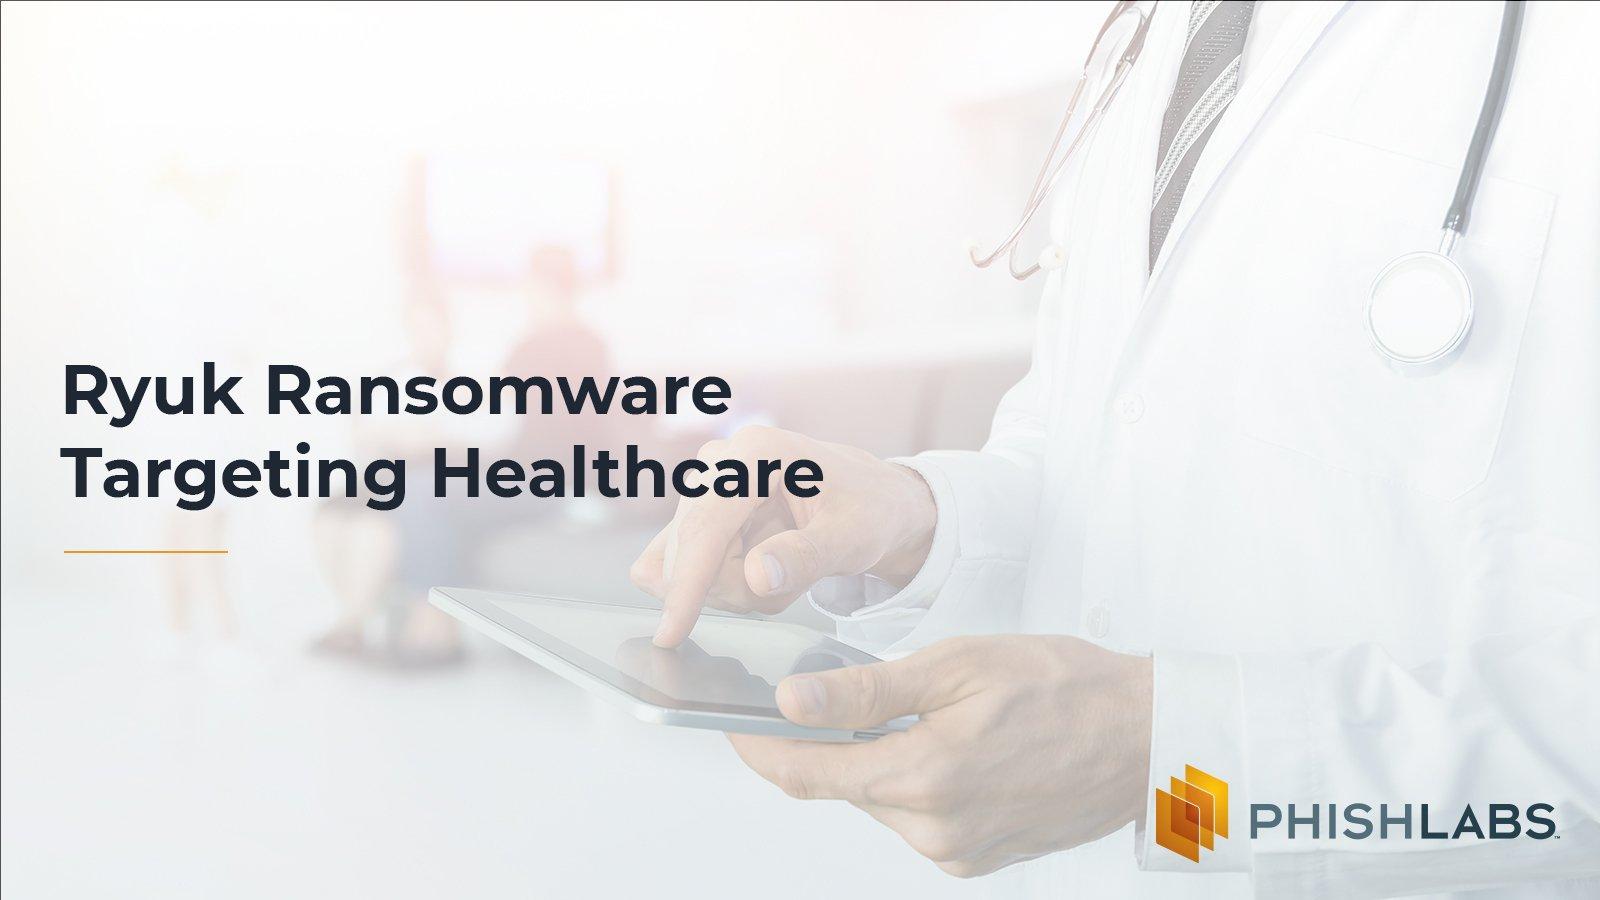 Ryuk Ransomware Targeting Healthcare